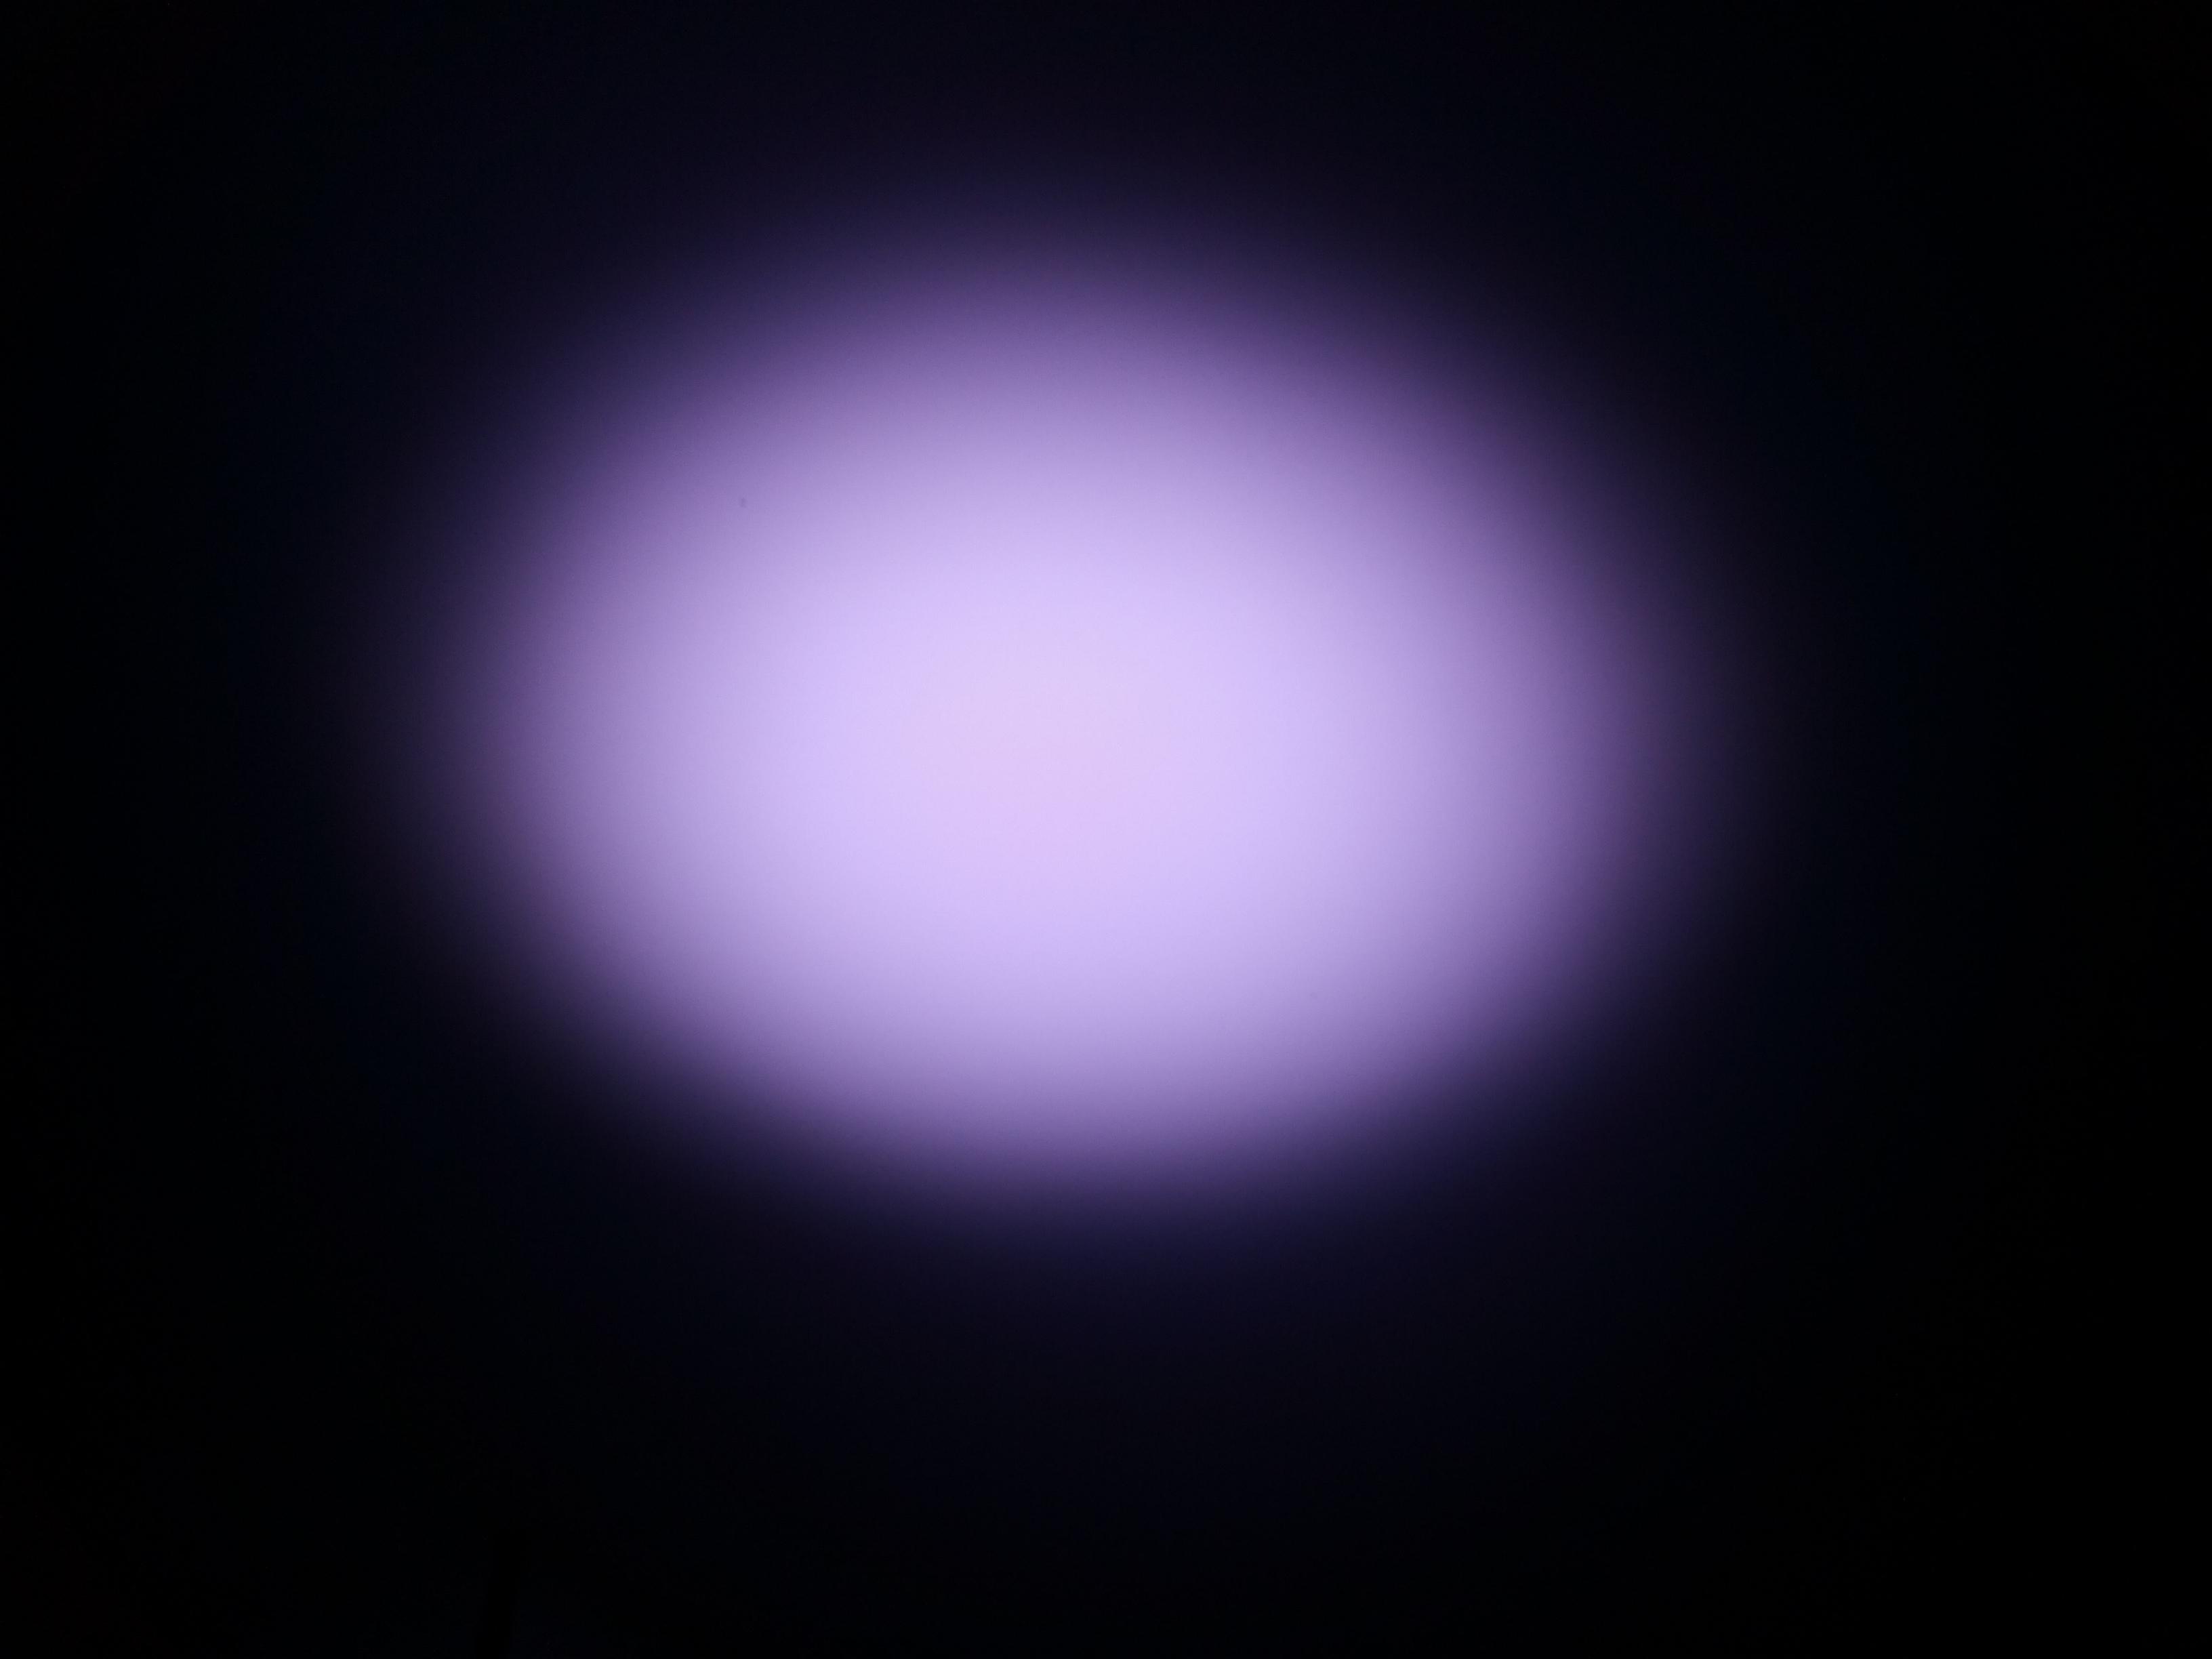 20170131_183150